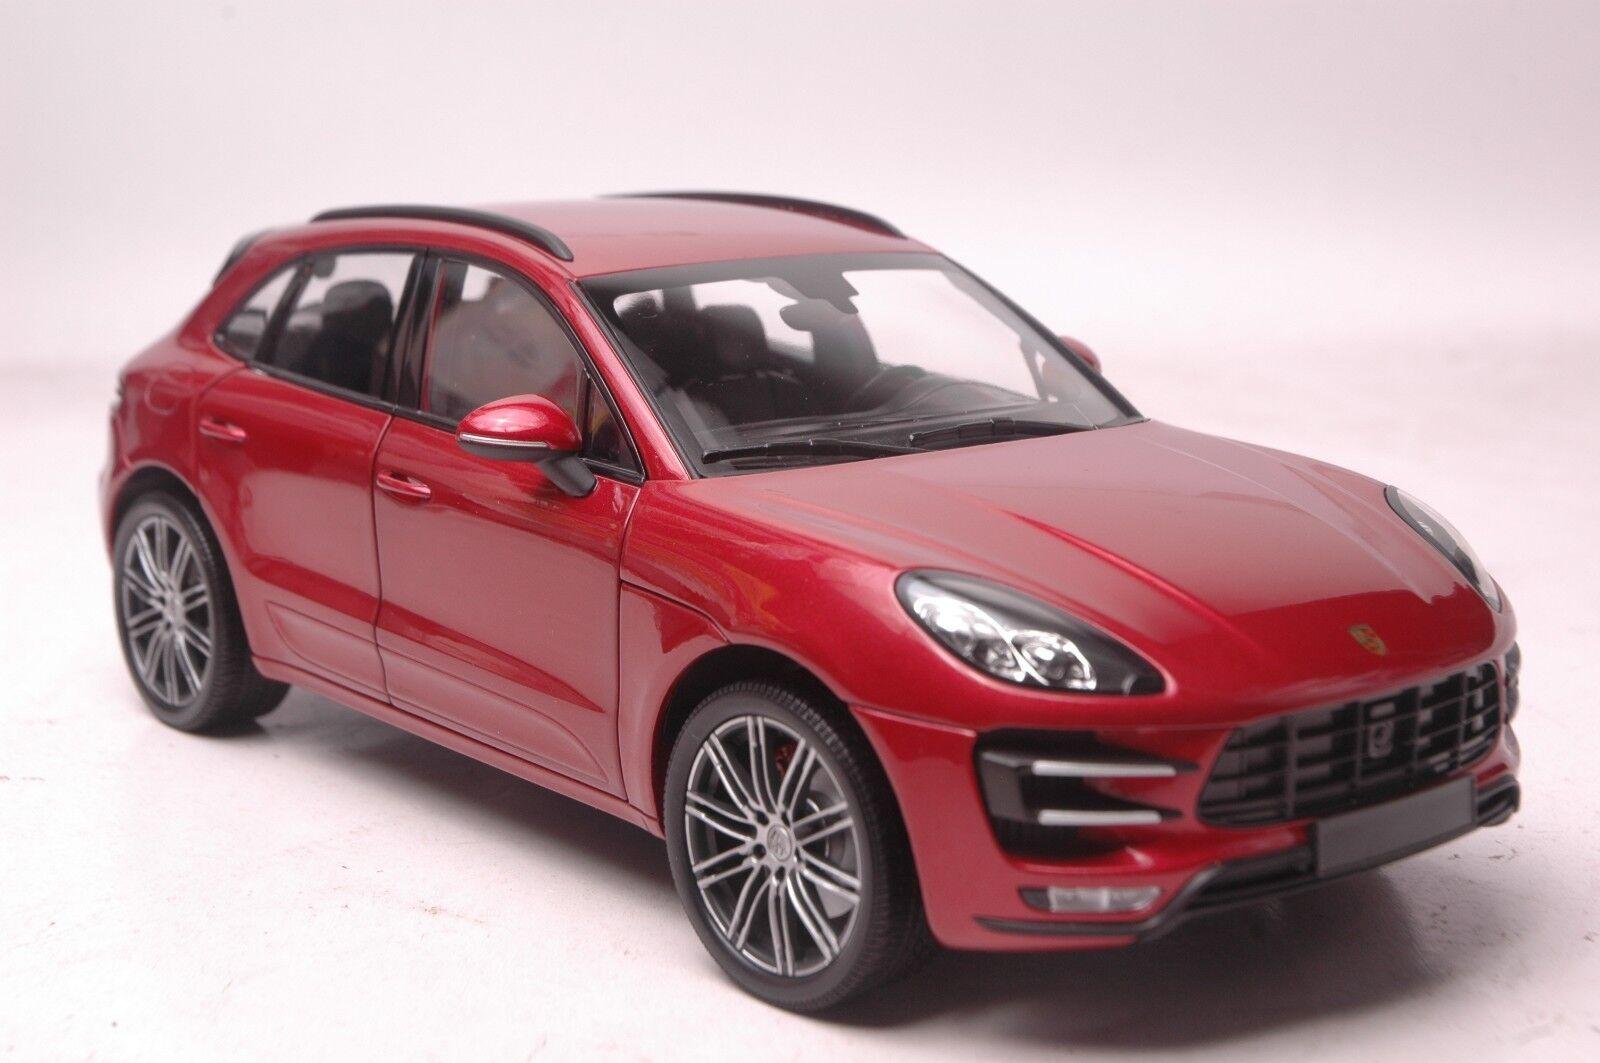 Porsche - suv - modell im maßstab macan 2013 18 rote